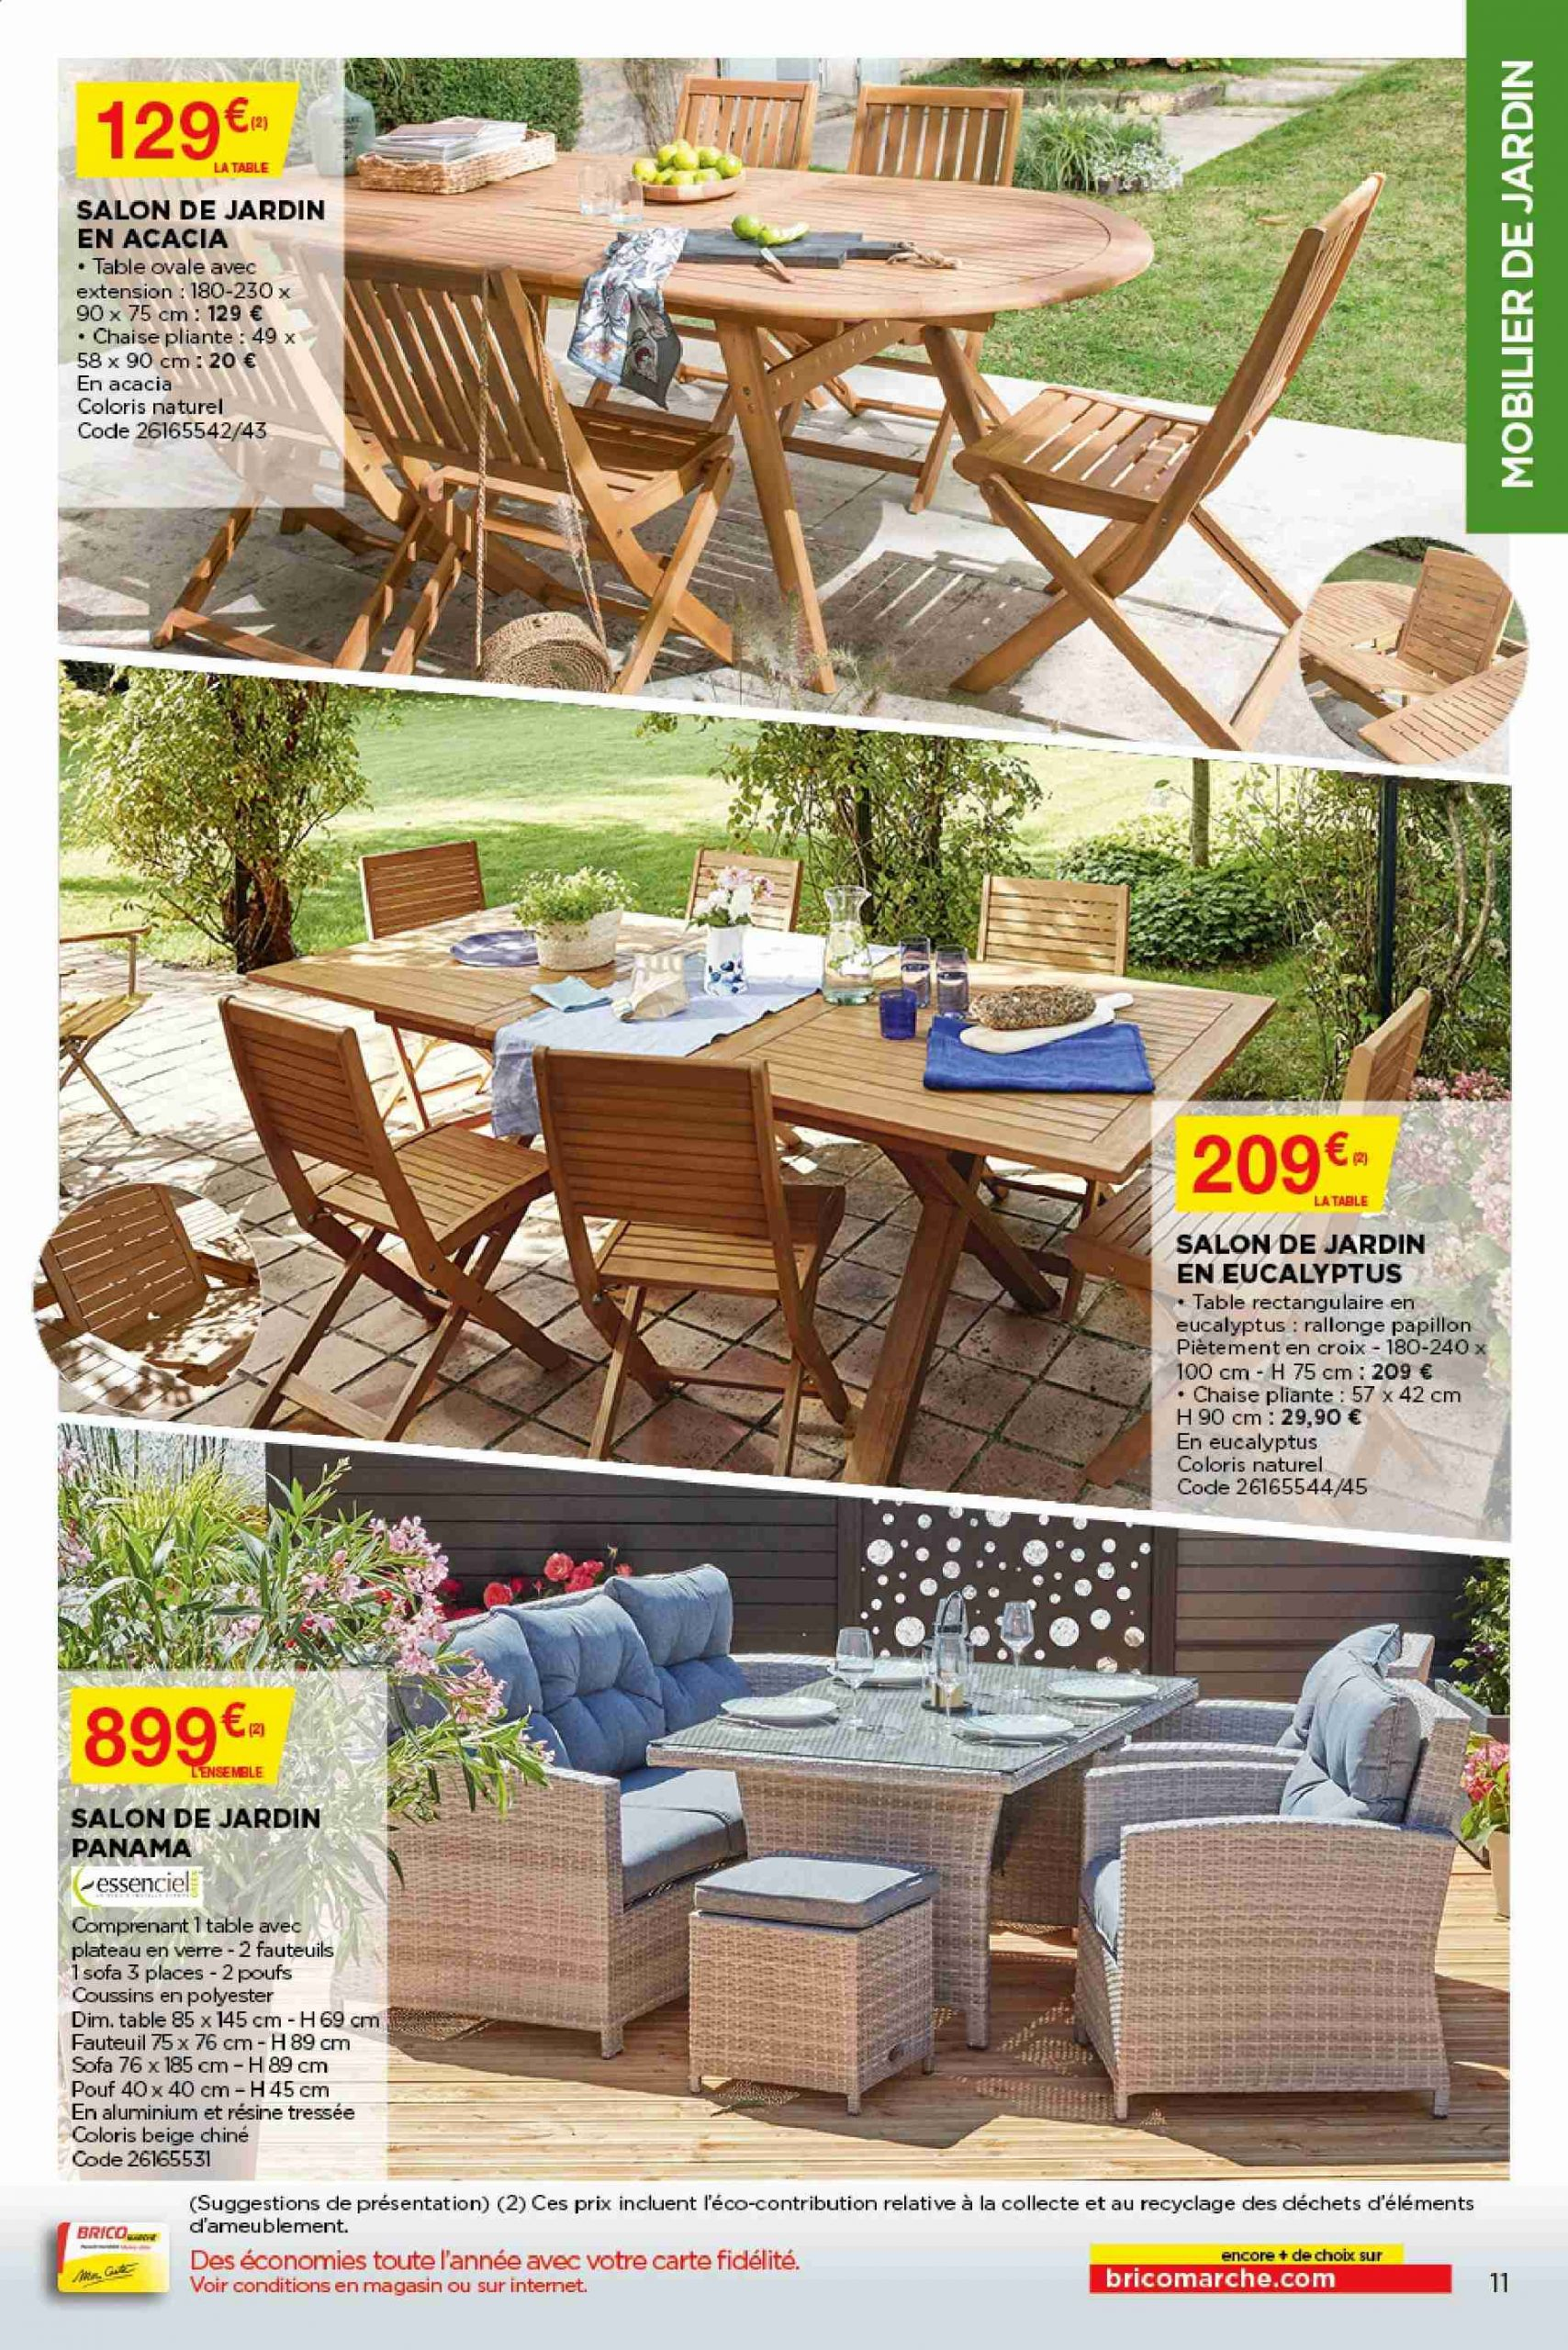 Table En Resine Tressée Inspirant Stunning Salon De Jardin Plastique Bri Arche Gallery Of 37 Best Of Table En Resine Tressée